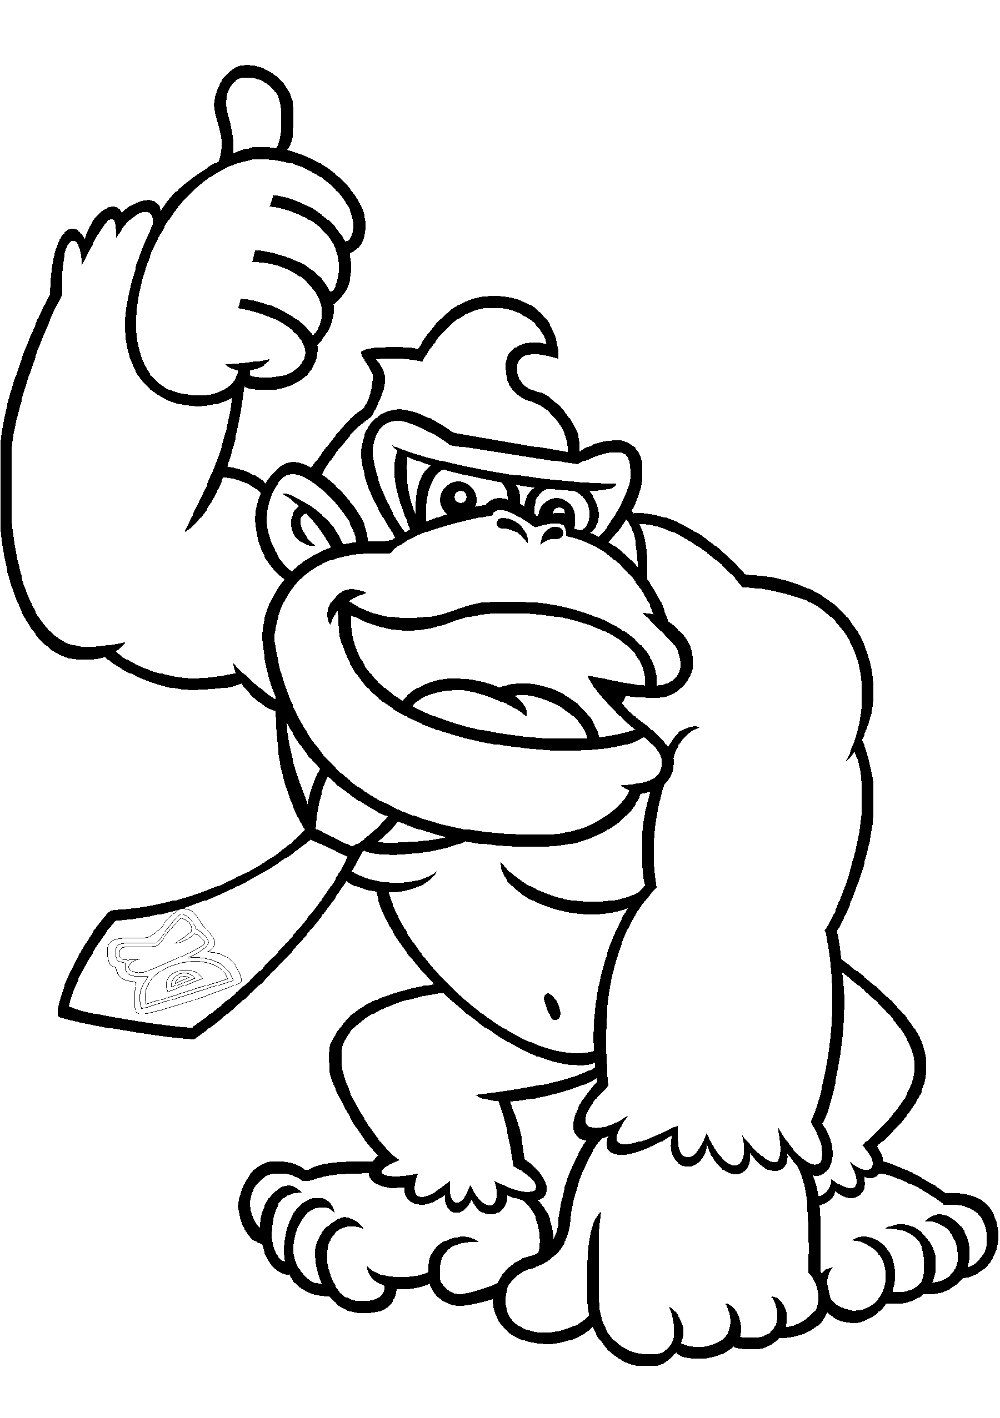 Donkey Kong Coloring Pages Educative Printable Coloring Pages Drawings Free Online Coloring